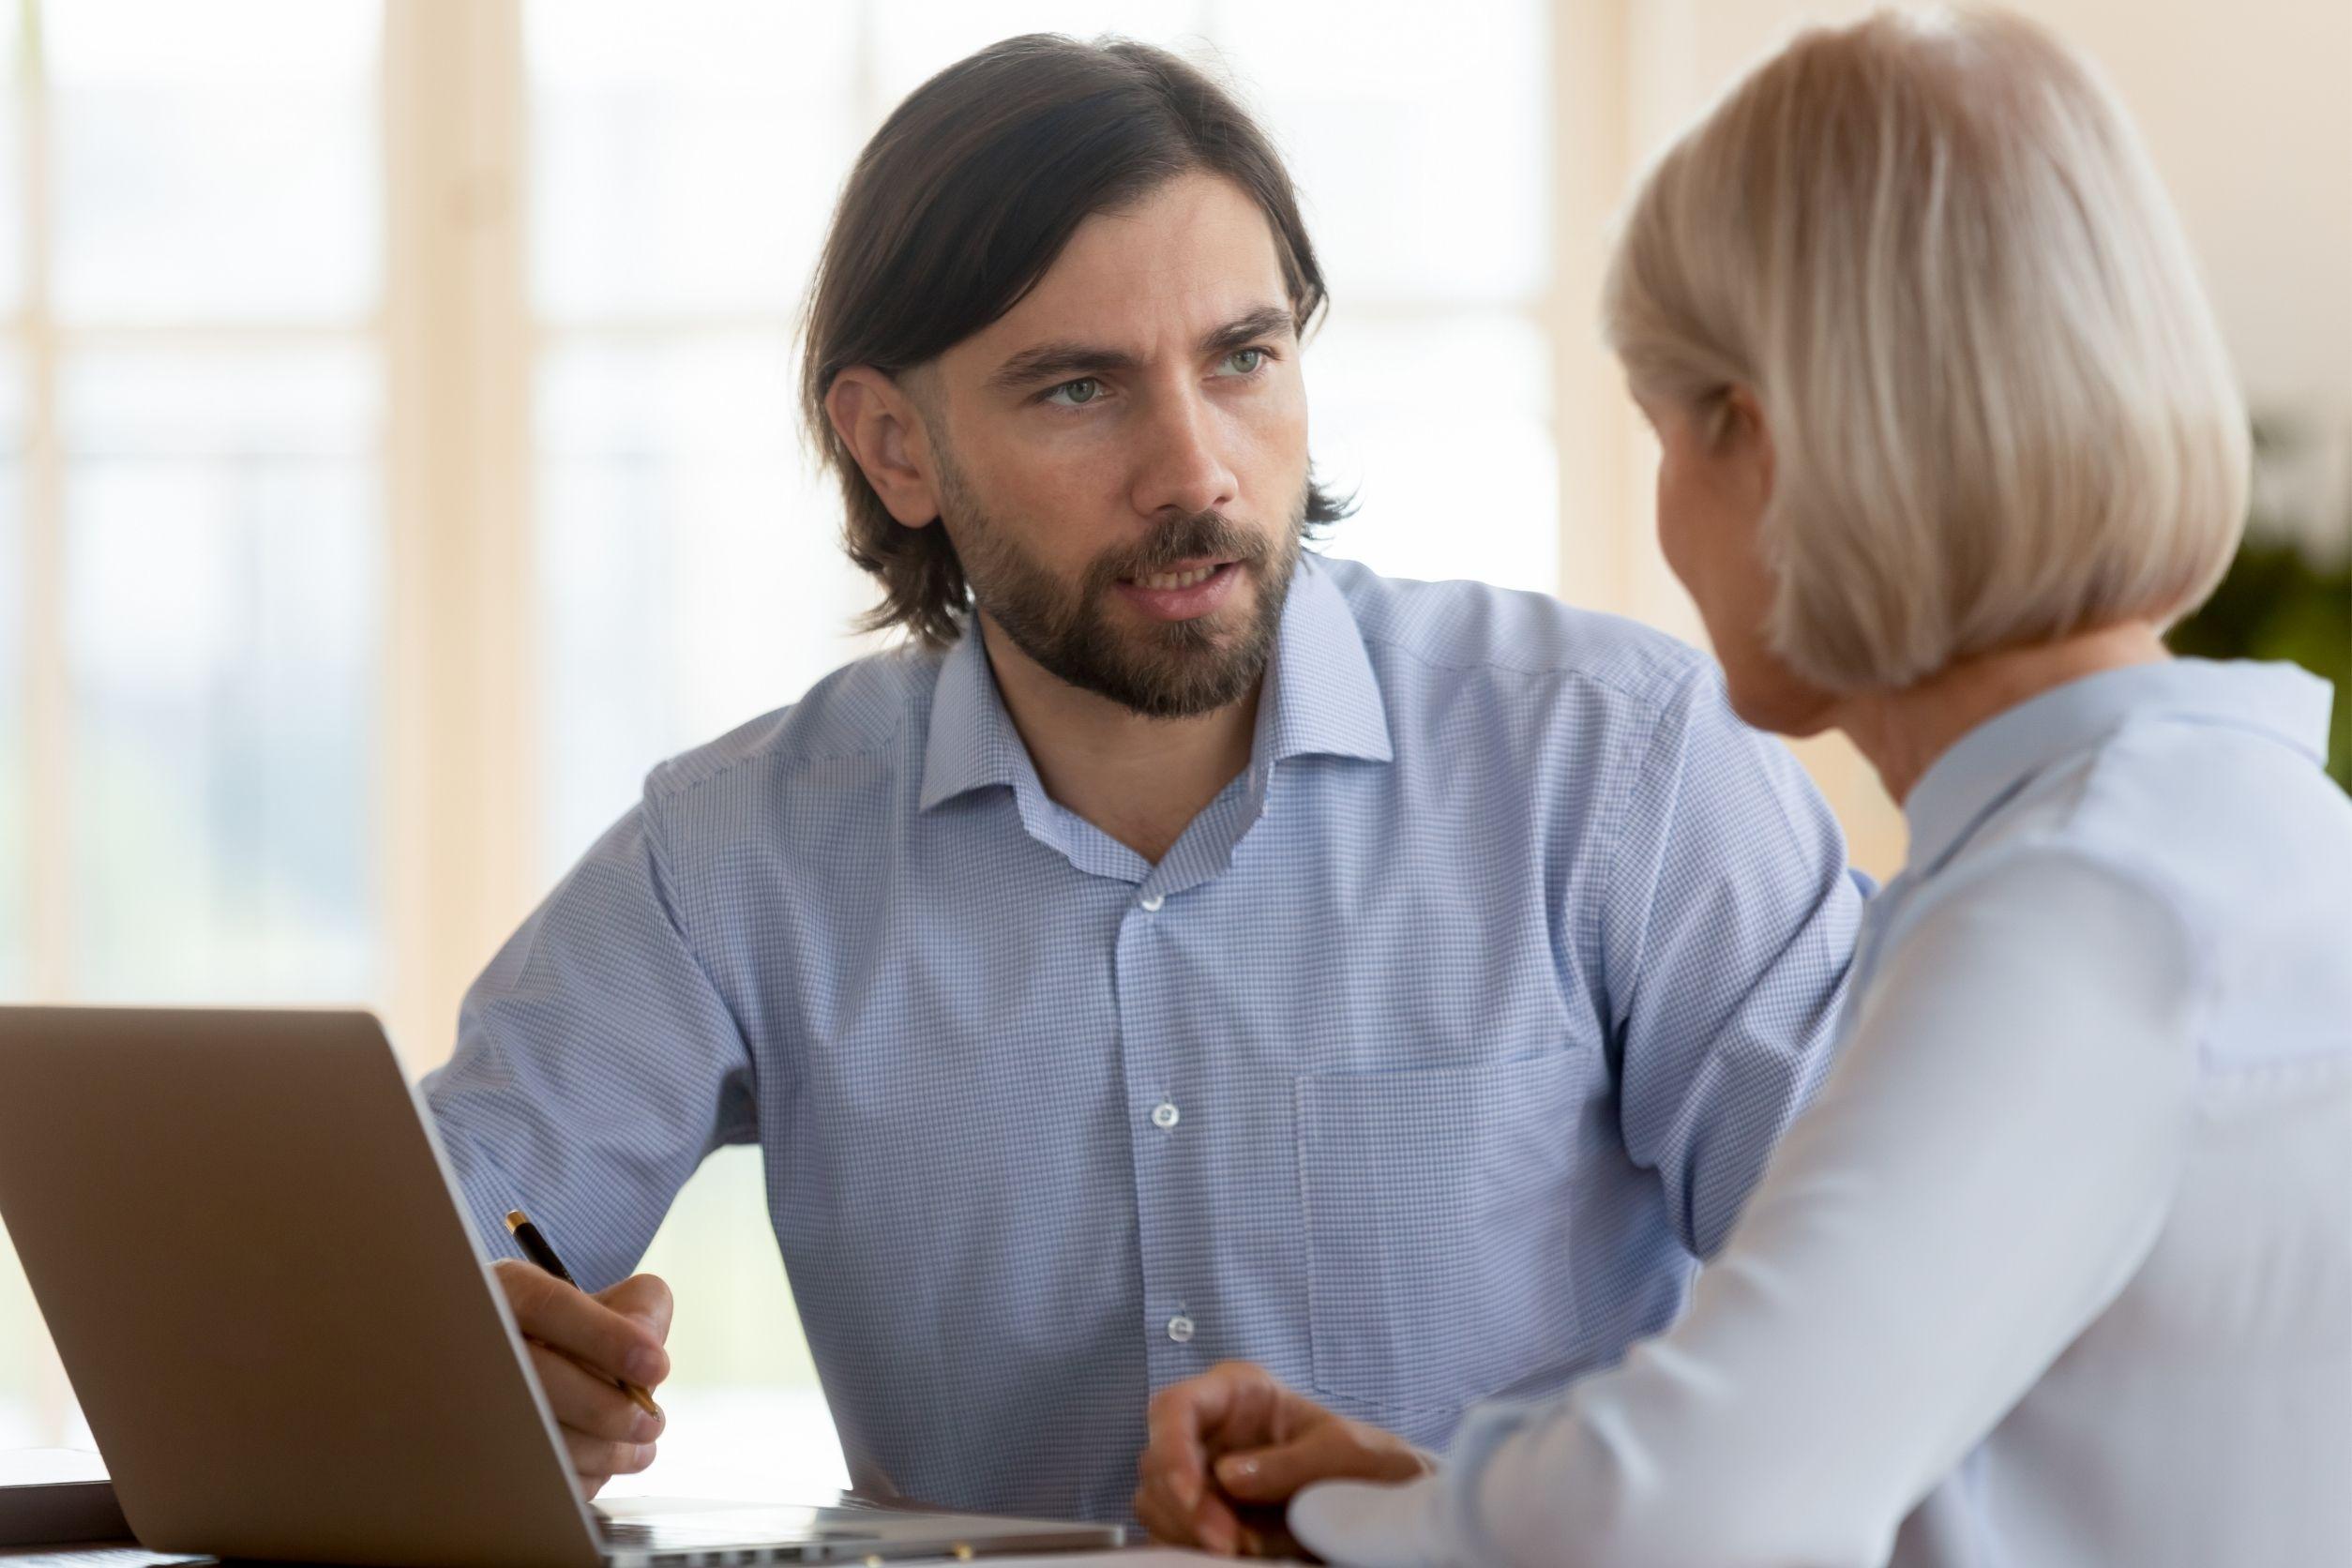 senior home care franchise owner talking to elder client